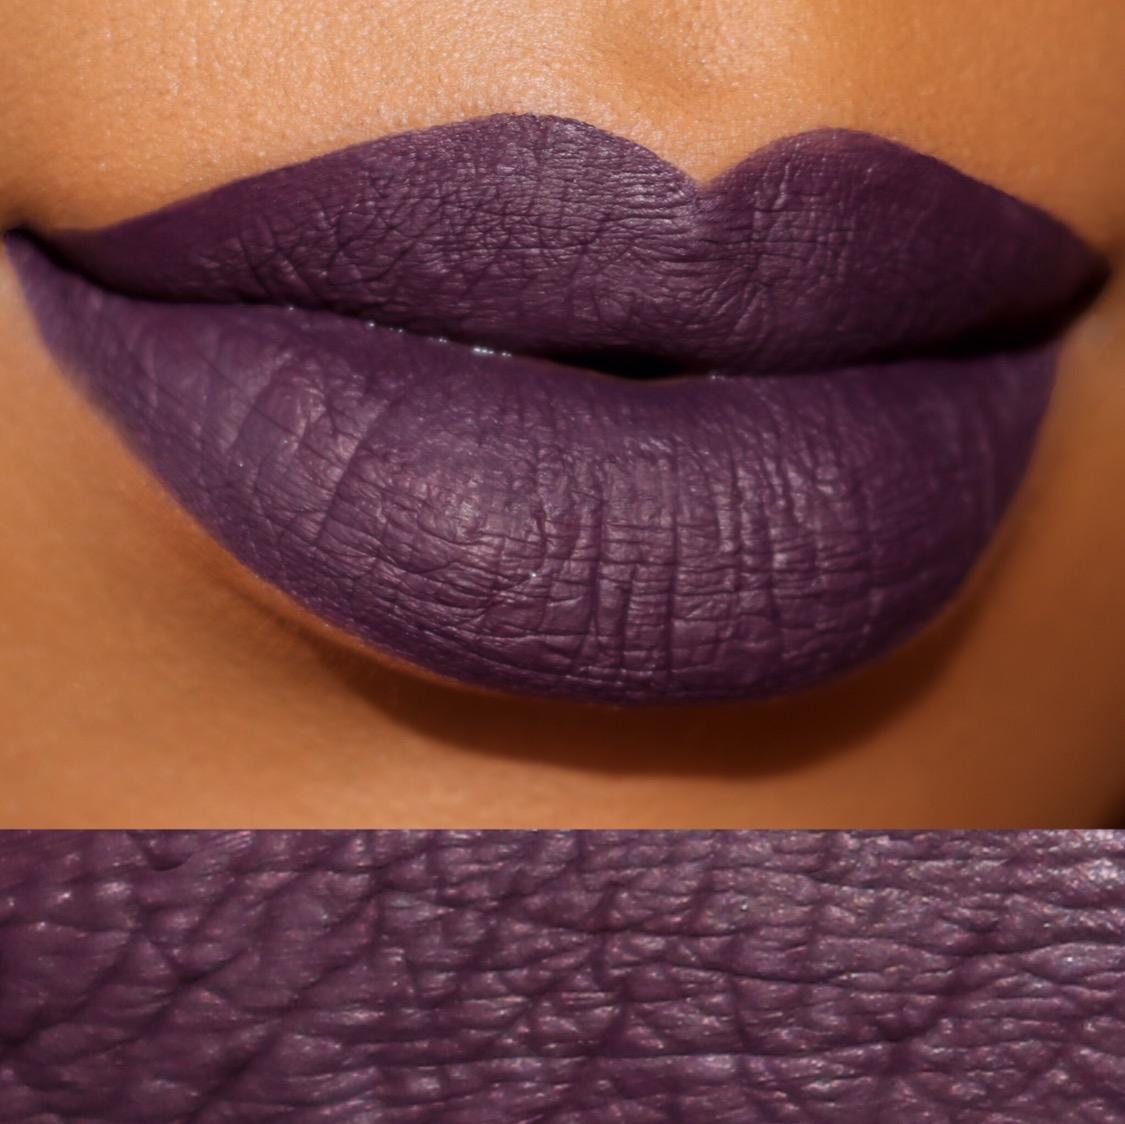 Kat Von D Beauty Sinner Everlasting Liquid Lipstick and Lipliner